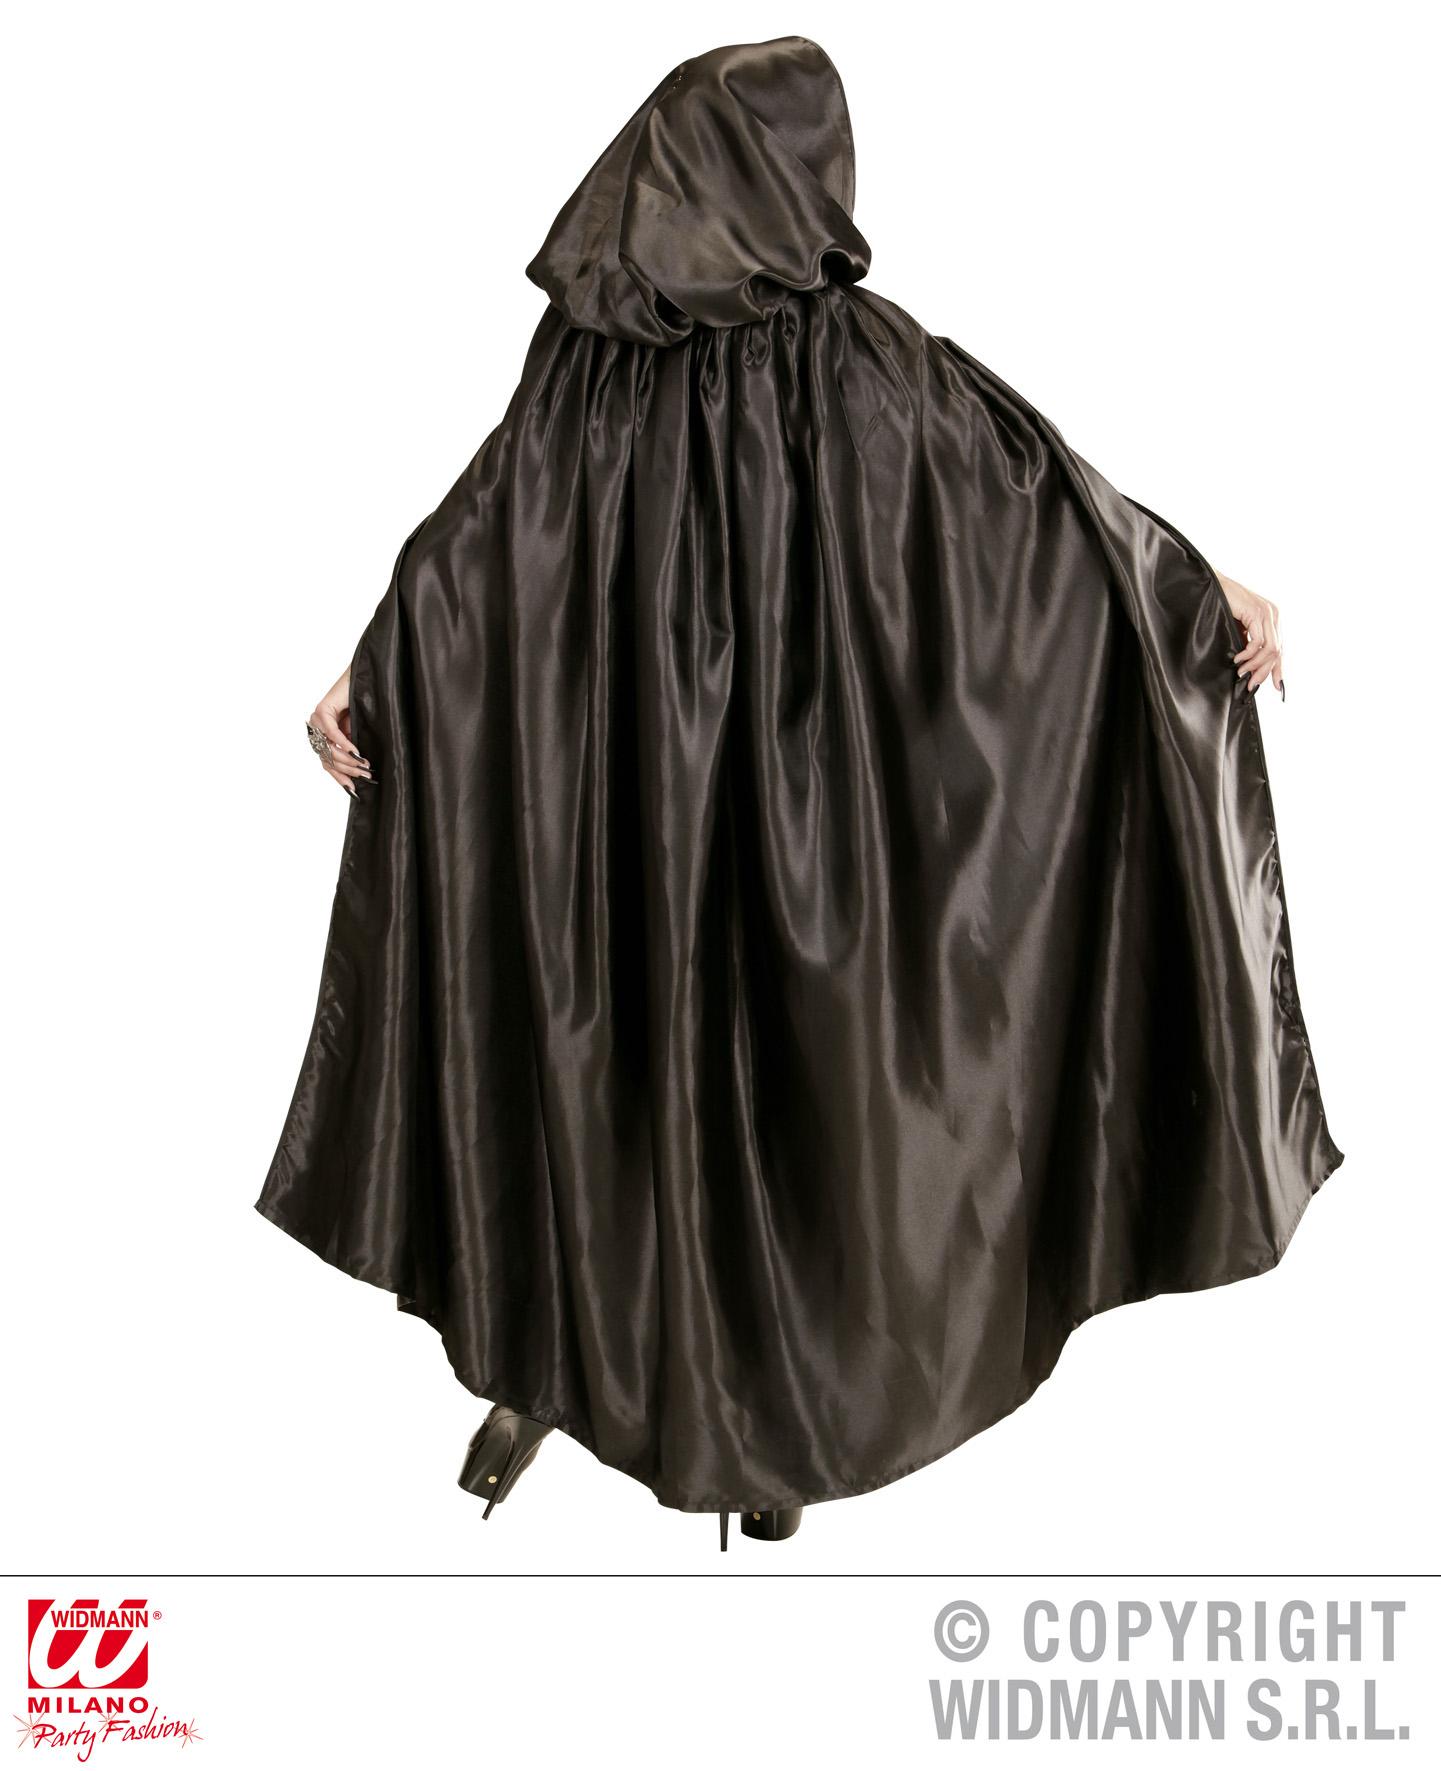 schwarzer umhang cape kapuze vampir venezia mittelalter damen herren. Black Bedroom Furniture Sets. Home Design Ideas